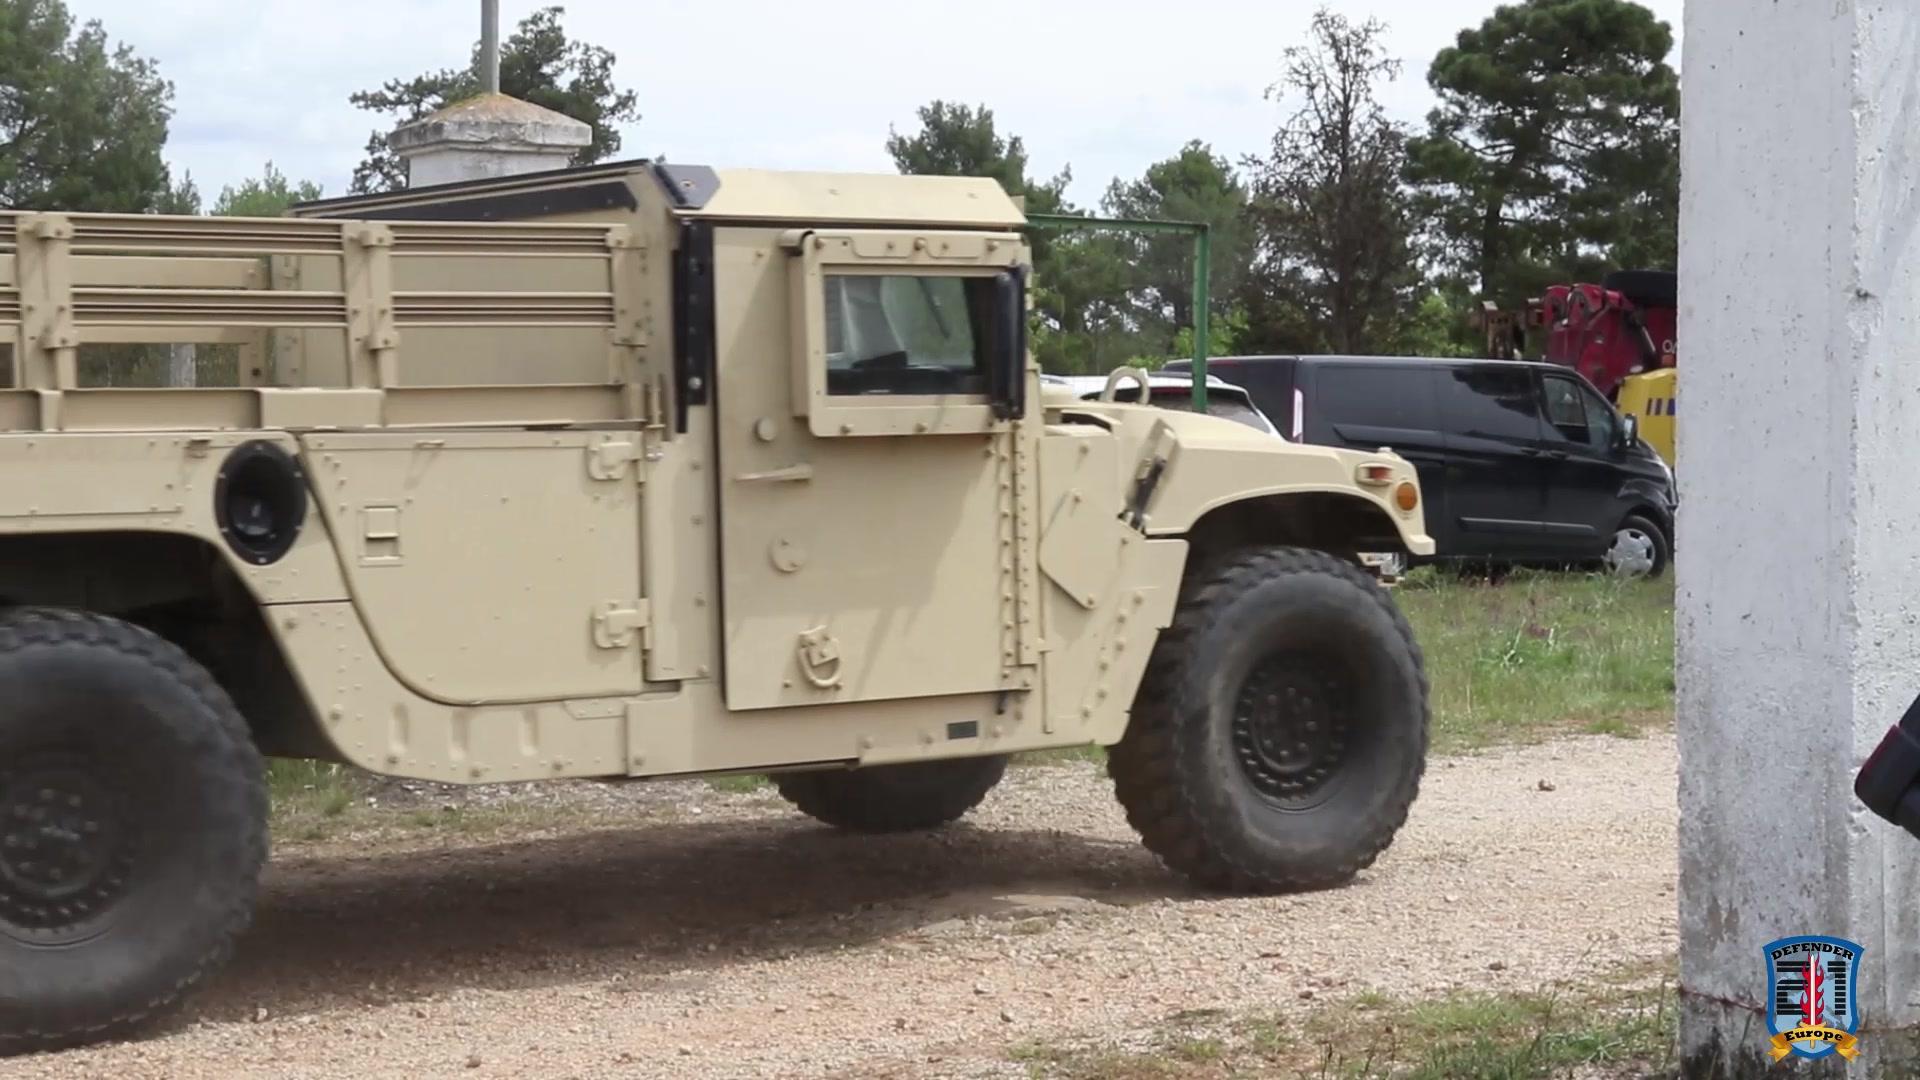 U.S equipment leaves for training area